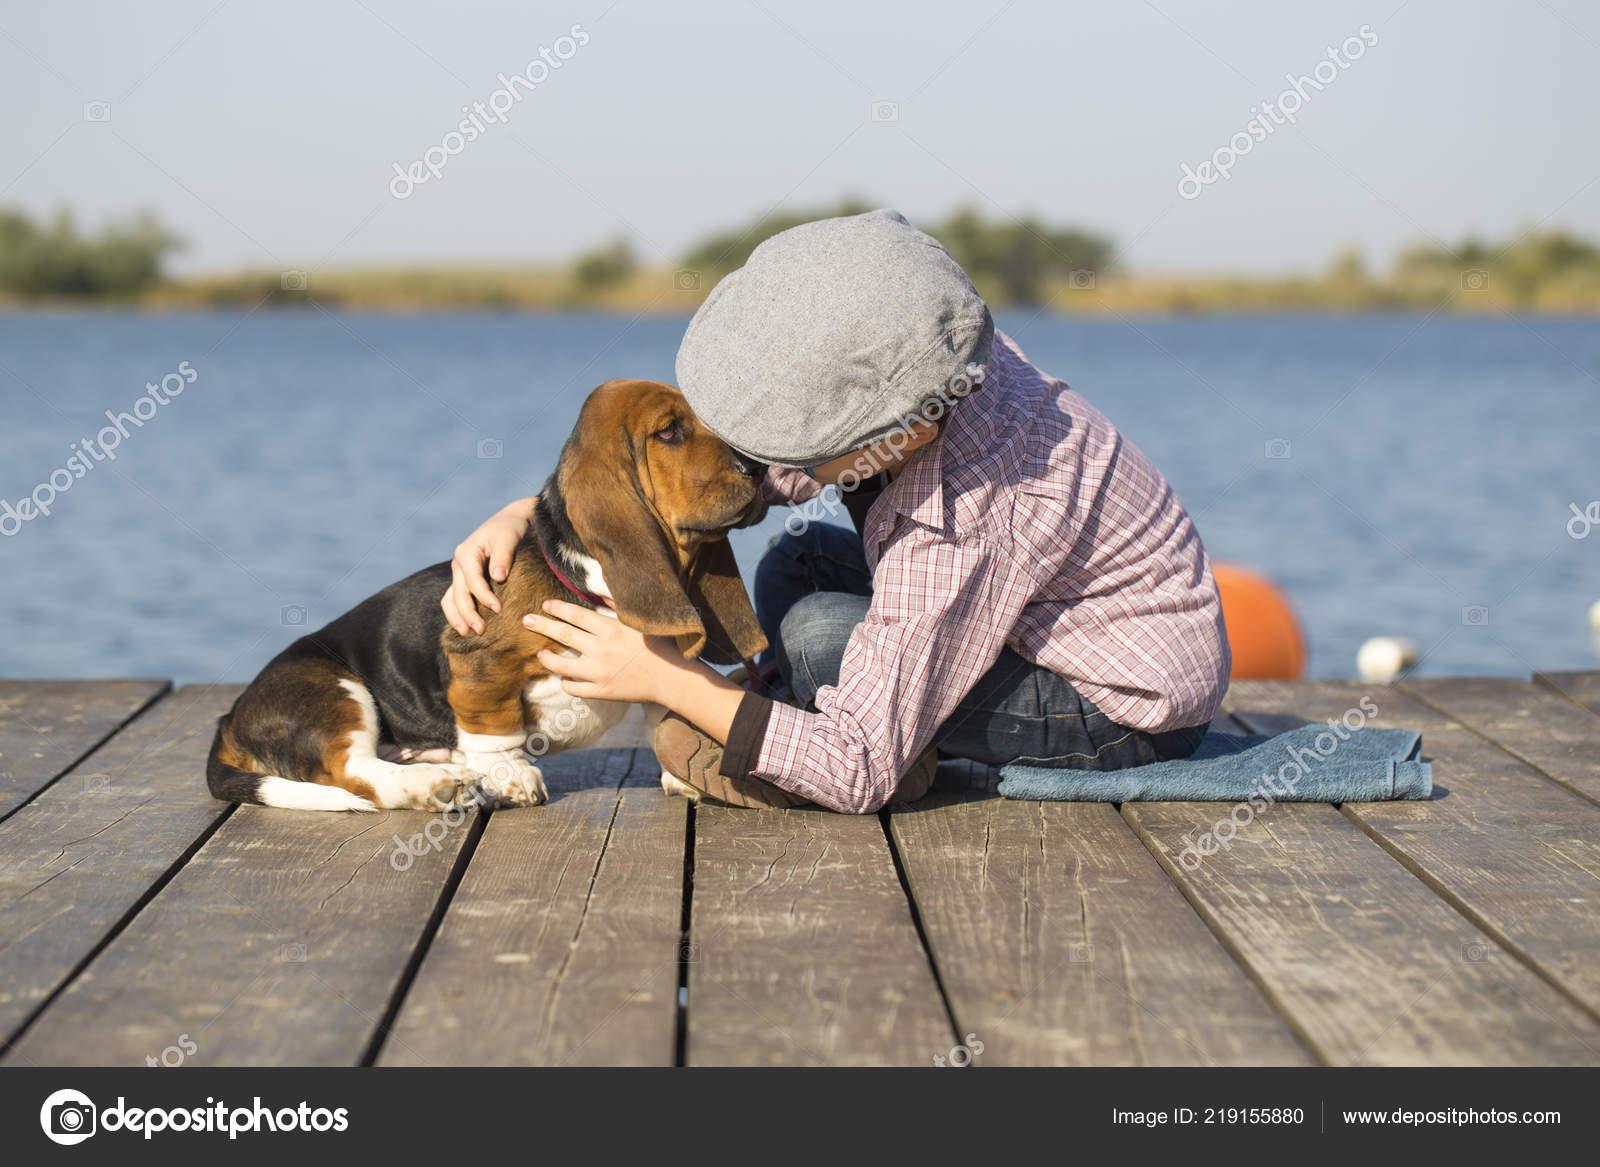 Little Cute Boy Sitting River His Dog Enjoy Together